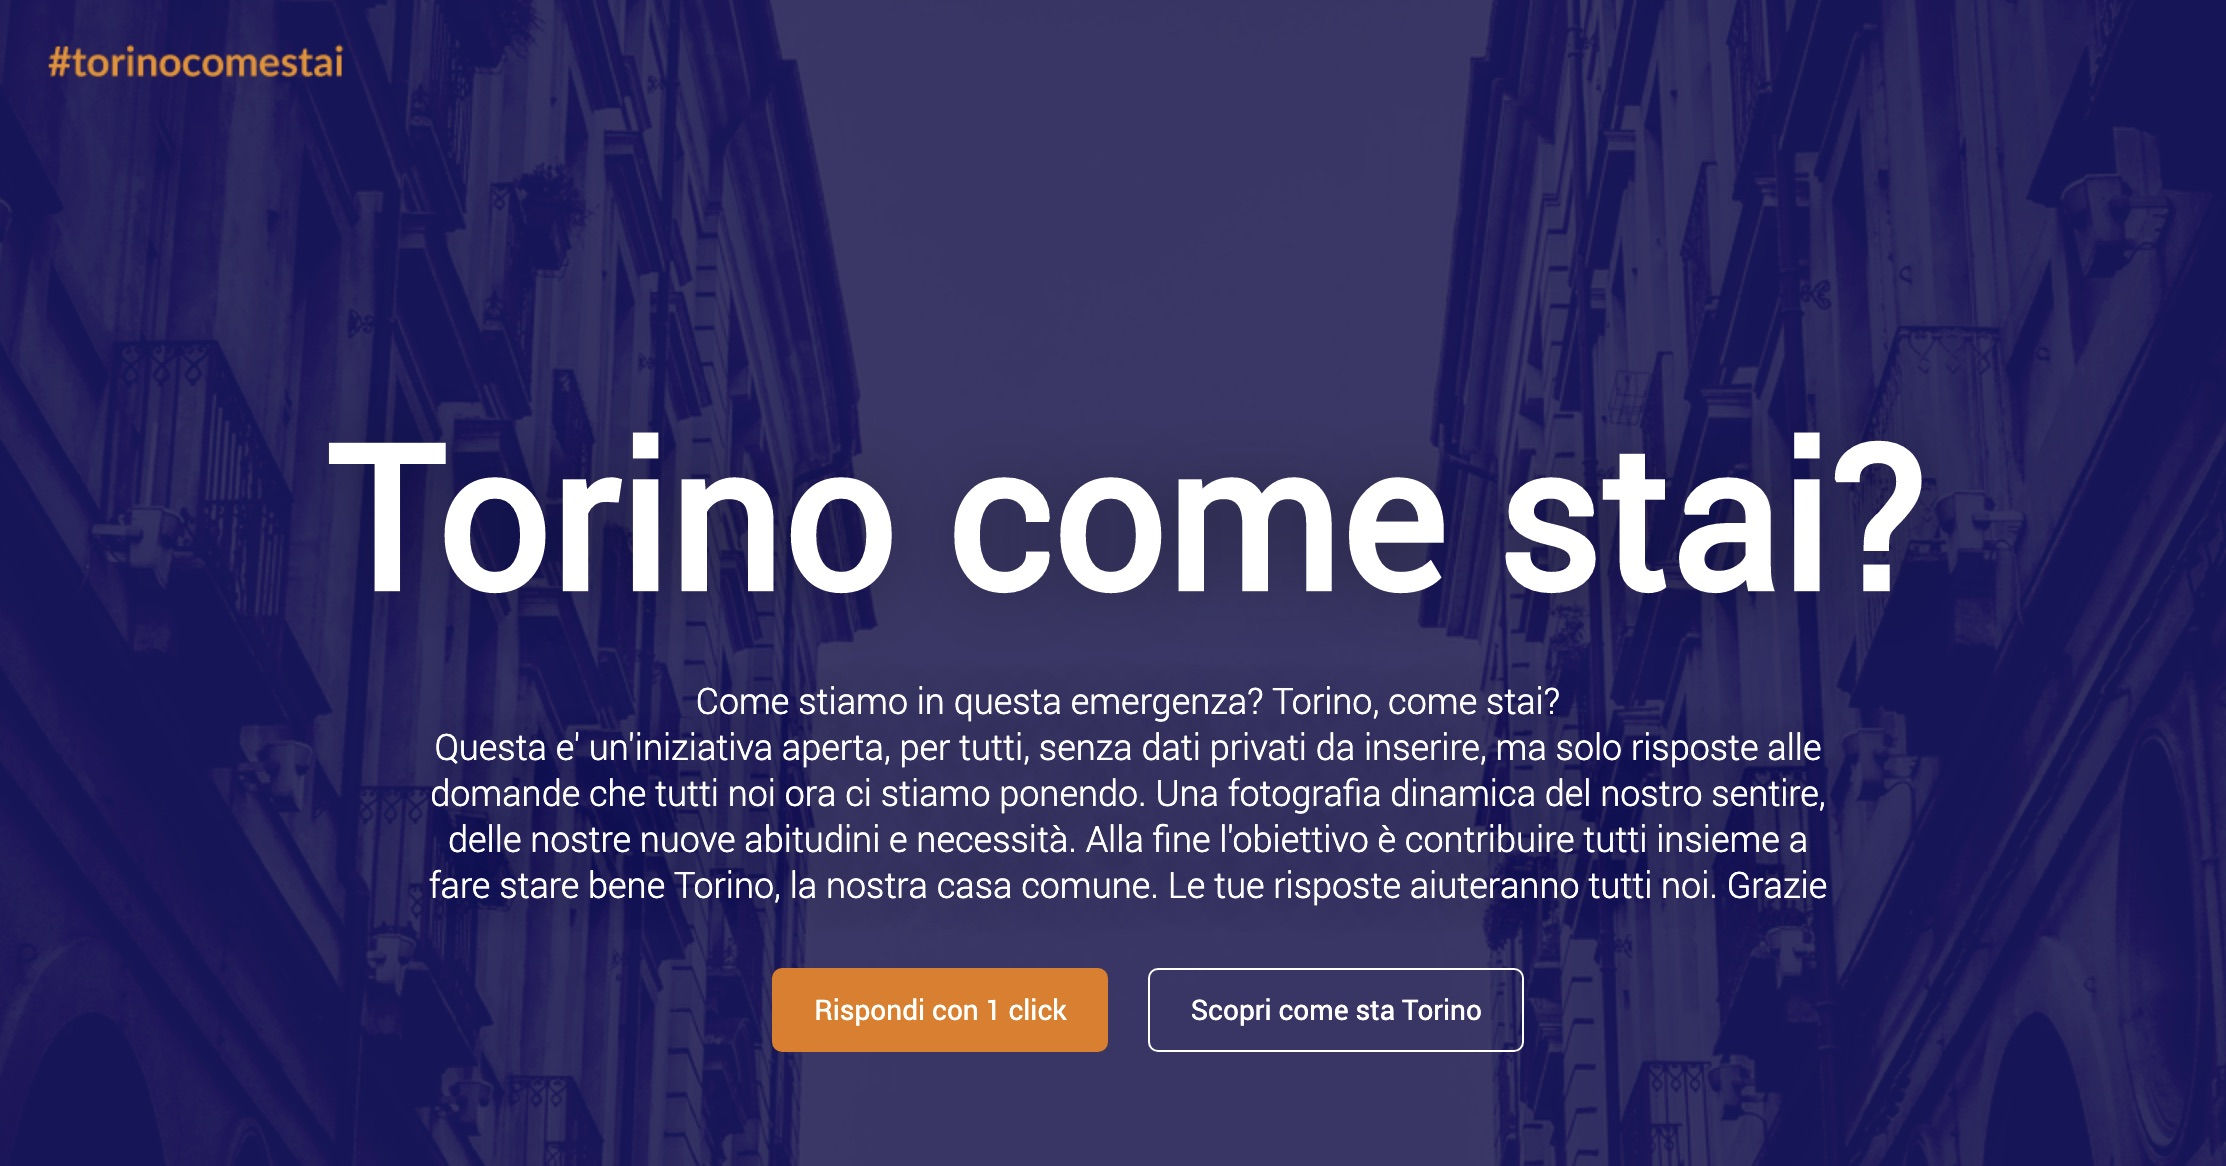 Torino come stai?